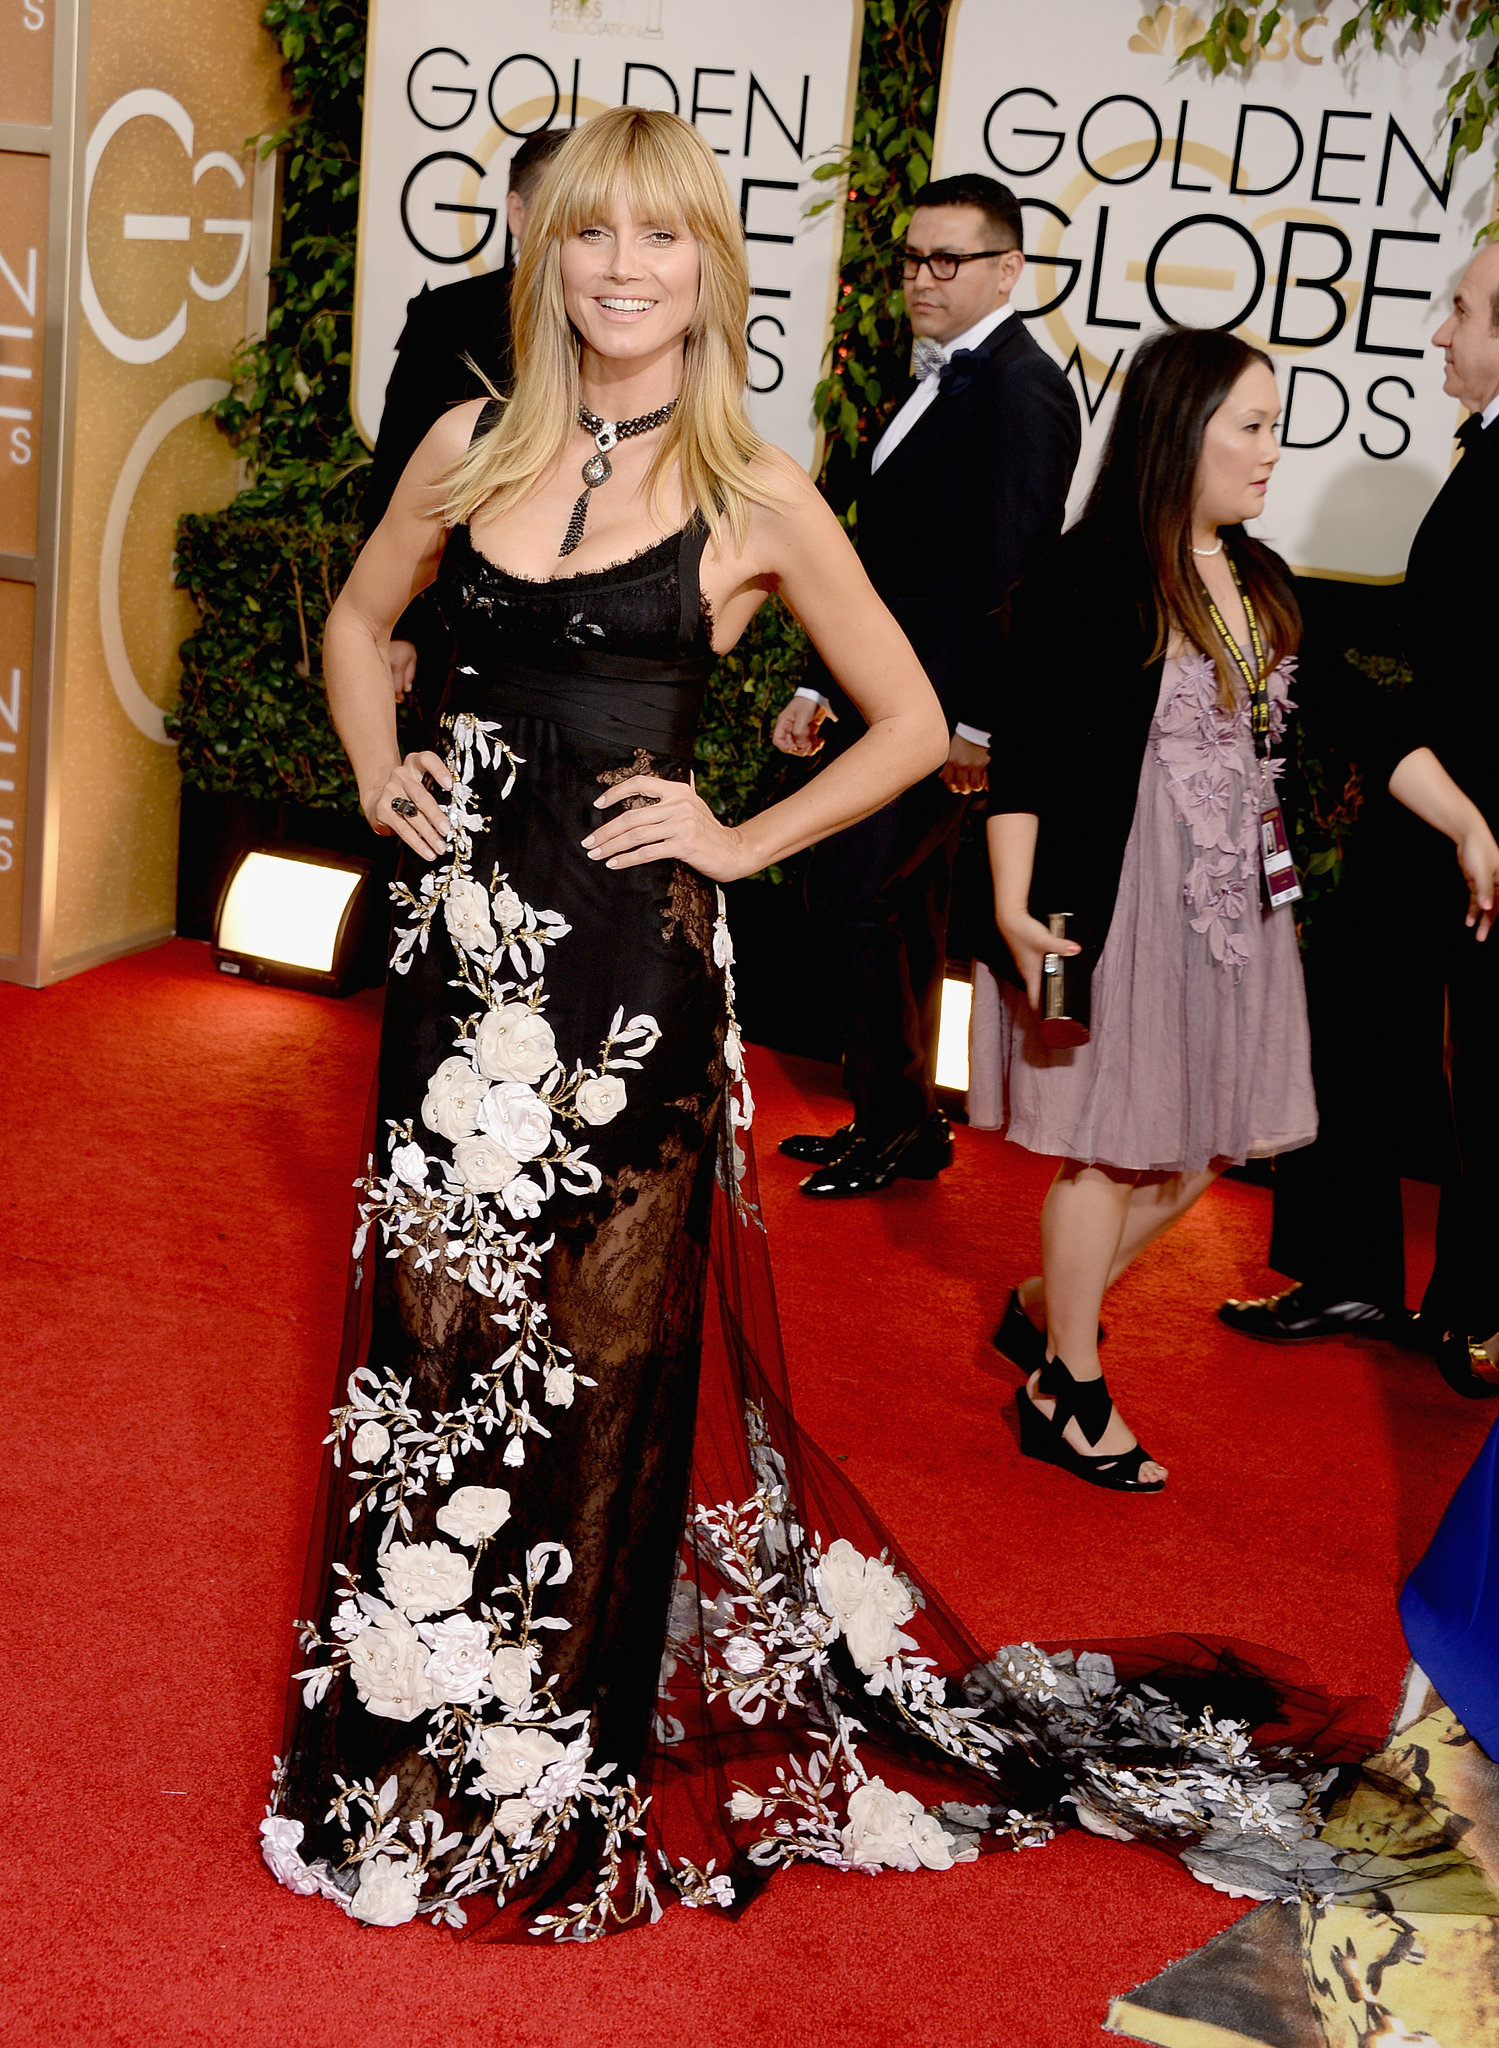 Heidi Klum wore Marchesa to the event.